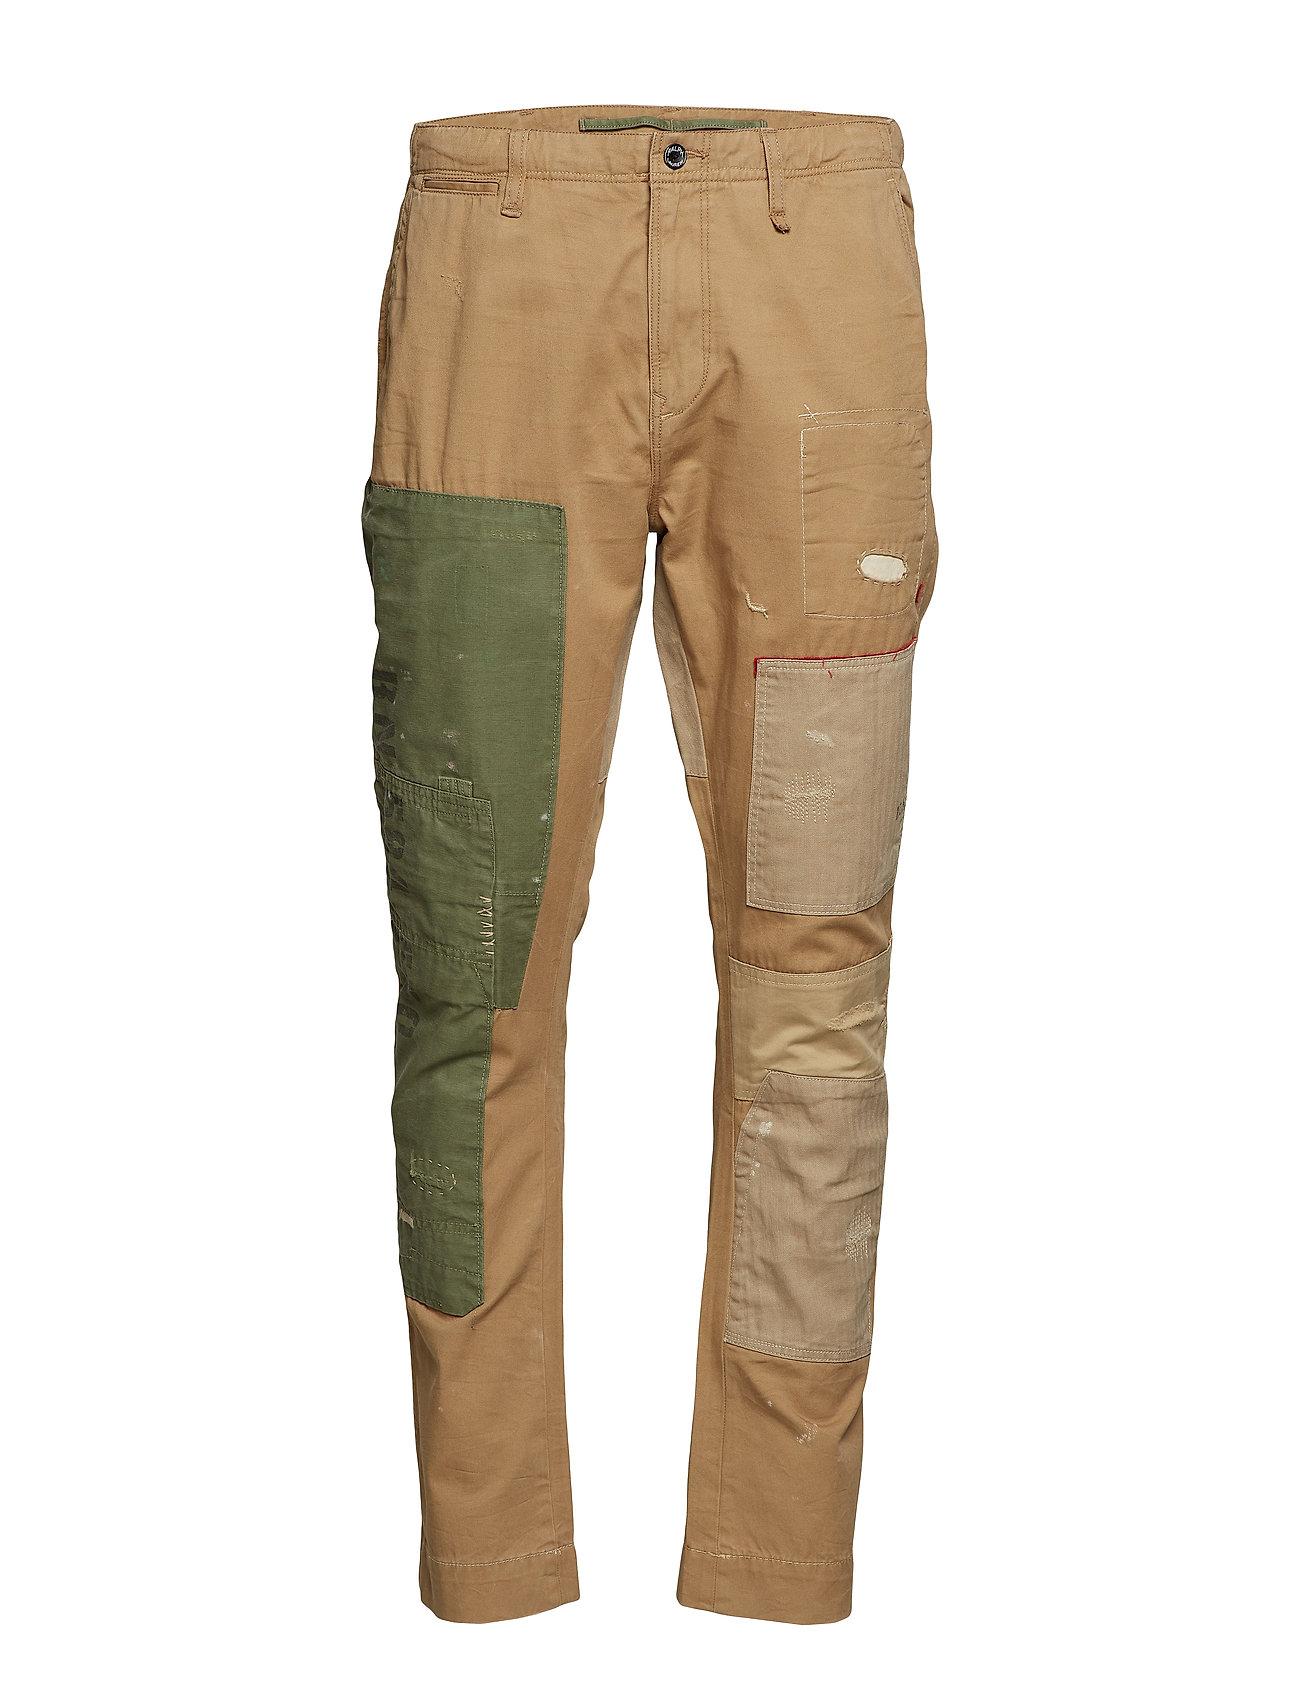 Polo Ralph Lauren Classic Tapered Fit Pant - KHAKI/OLIVE MULTI